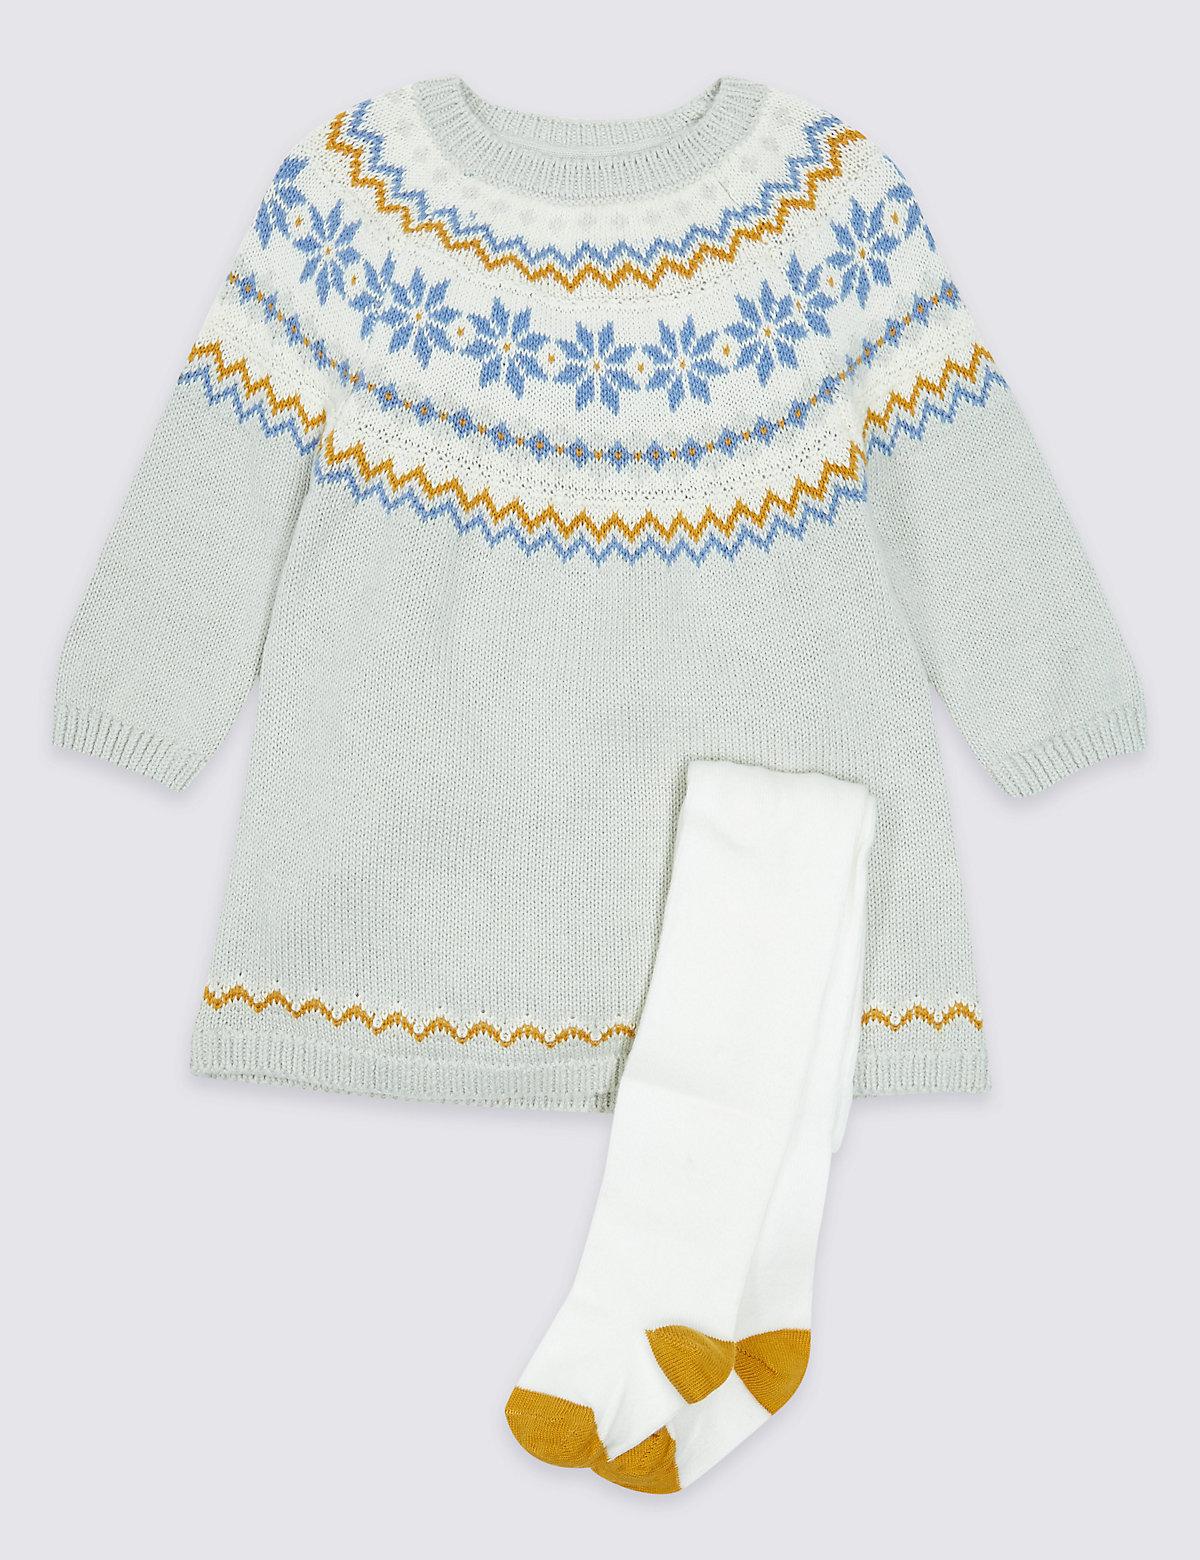 2 Piece Intarsia Fairisle Dress with Tights